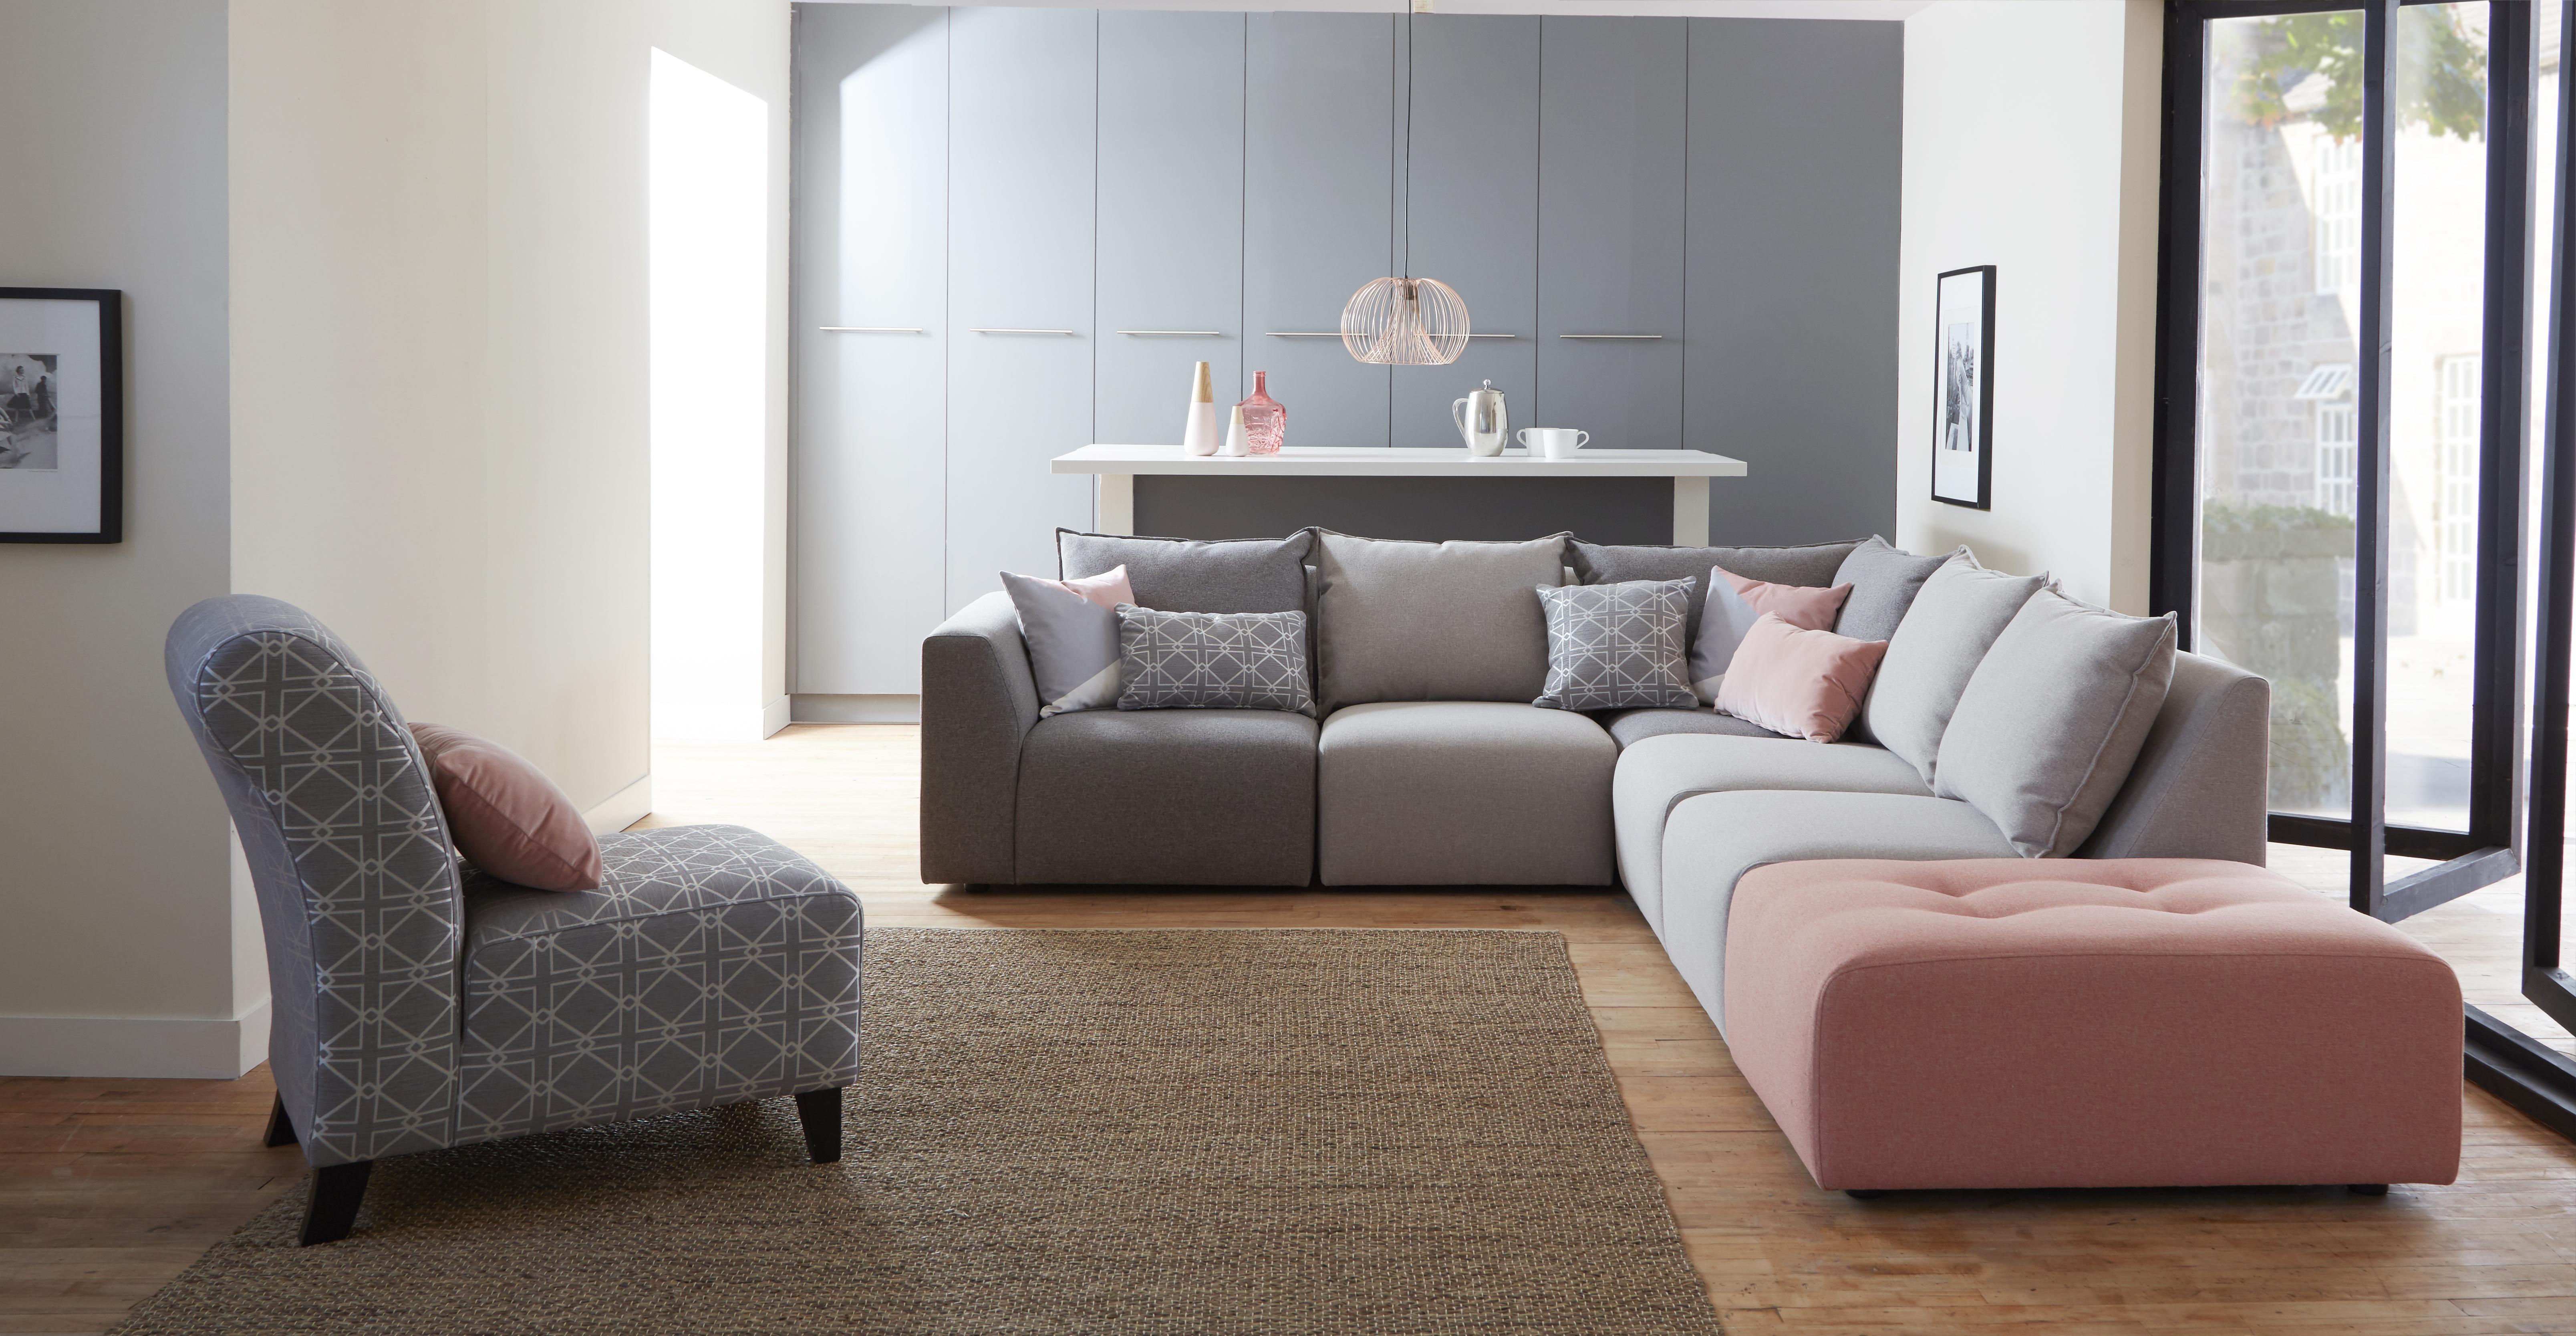 modular sofas ireland durablend antique sofa dfs dusky range